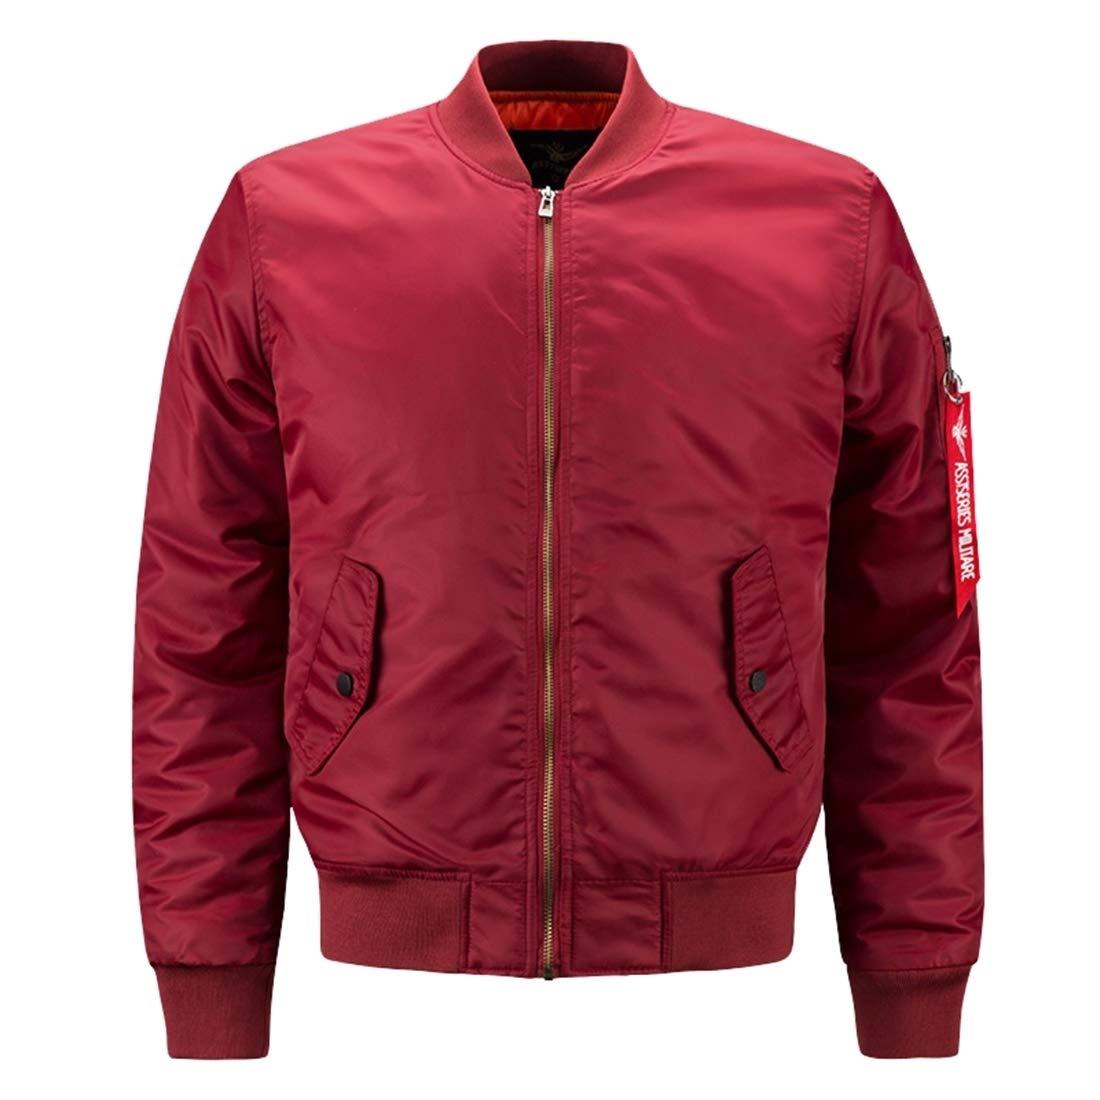 7b7af10f0 Red Men Heavy Flight Bomber Jacket Jacket Jacket Windbreaker Casual ...